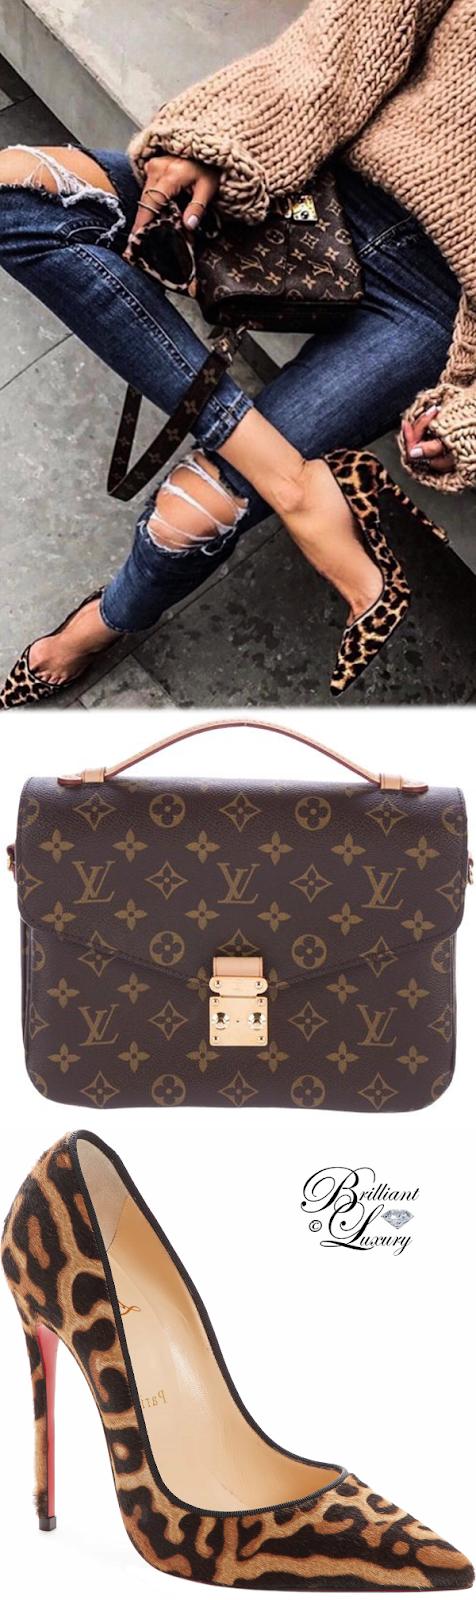 Brilliant Luxury ♦  Louis Vuitton Monogram Pochette-Métis and Christian Louboutin So Kate pumps #brown #leopard #streetstyle